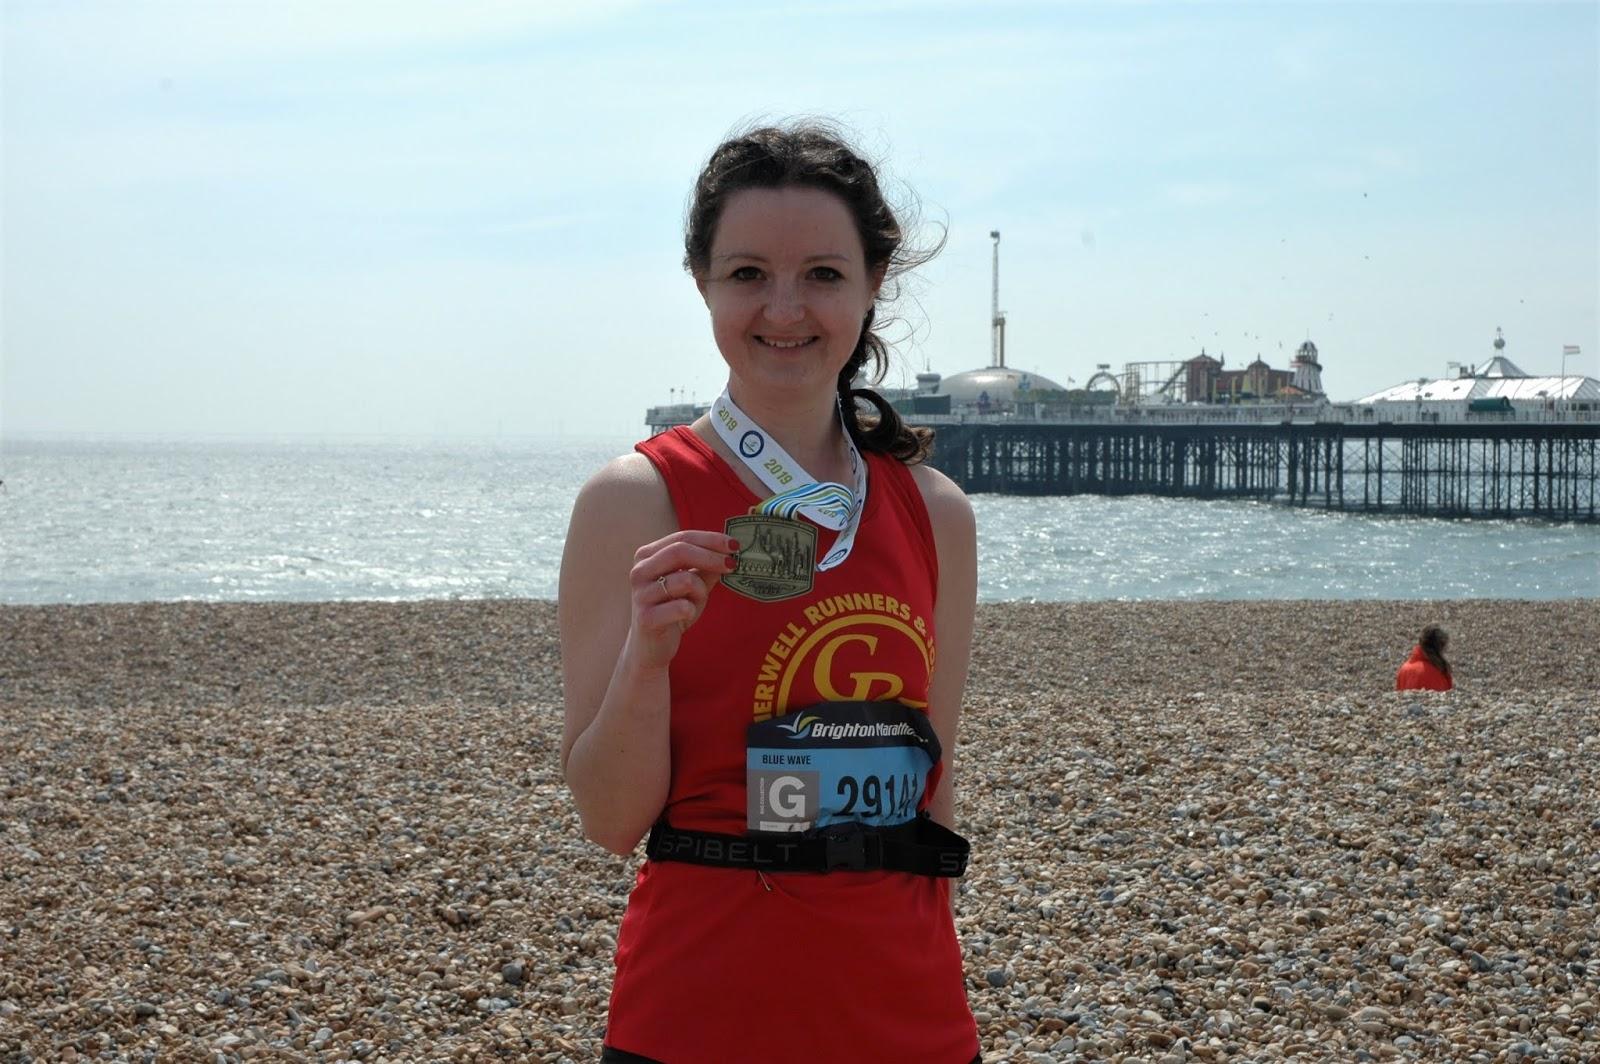 Brighton Marathon Medal 2019